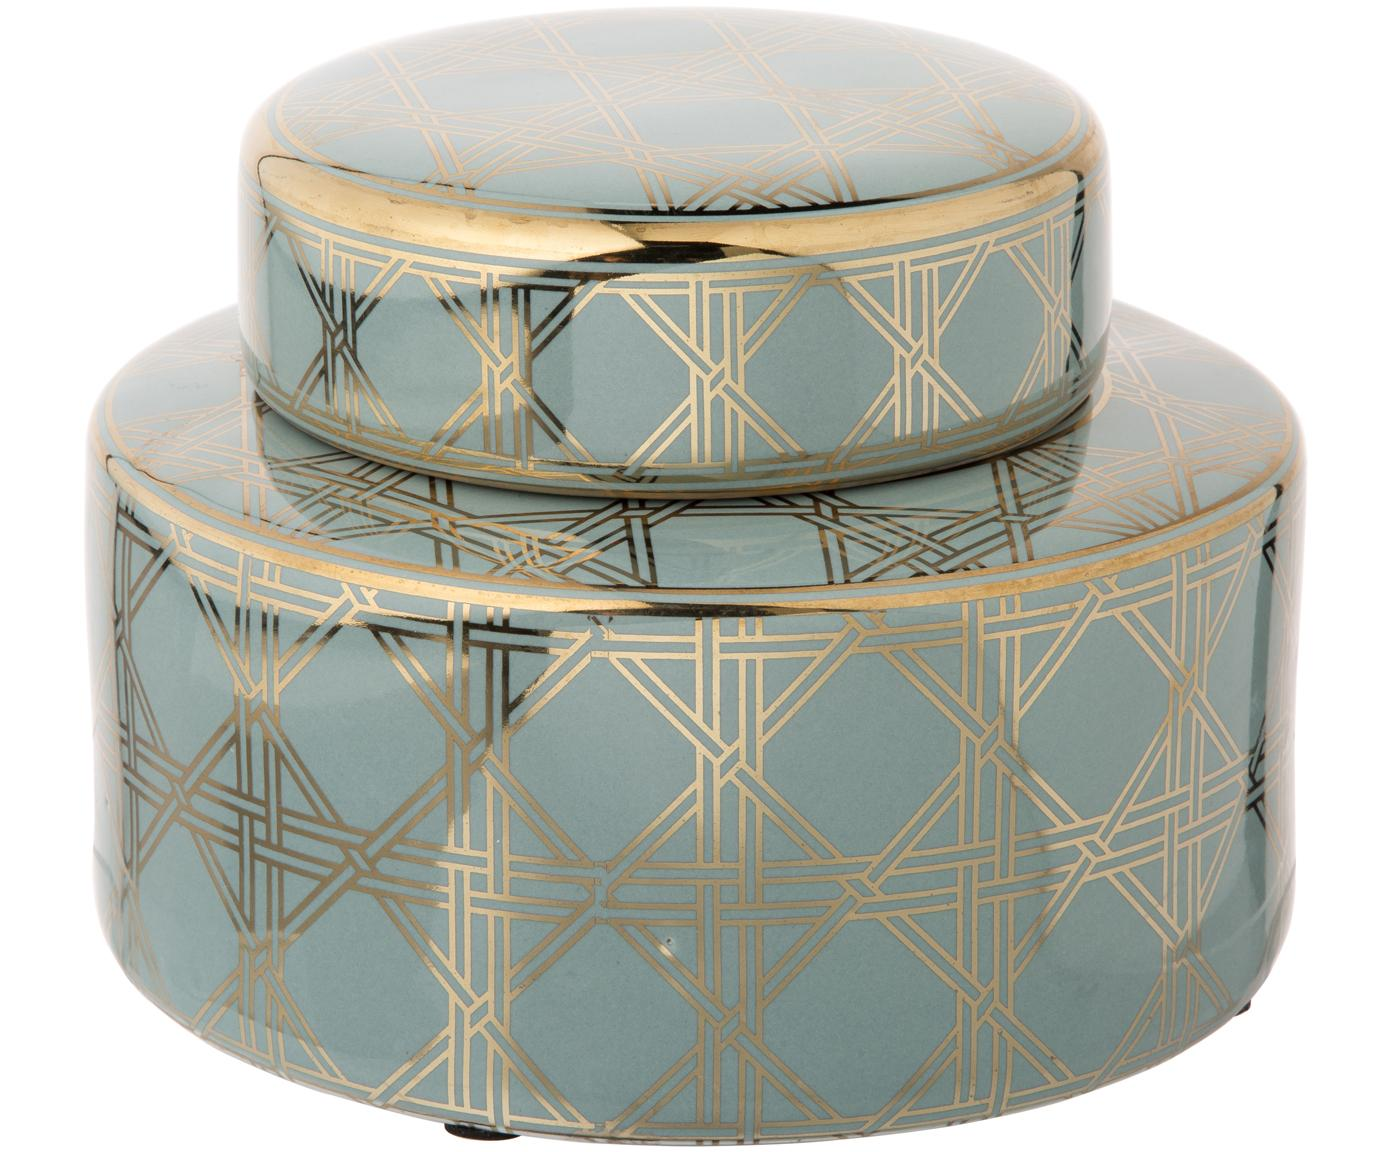 Aufbewahrungsdose Egypt, Porzellan, Türkis, Goldfarben, Ø 23 x H 16 cm